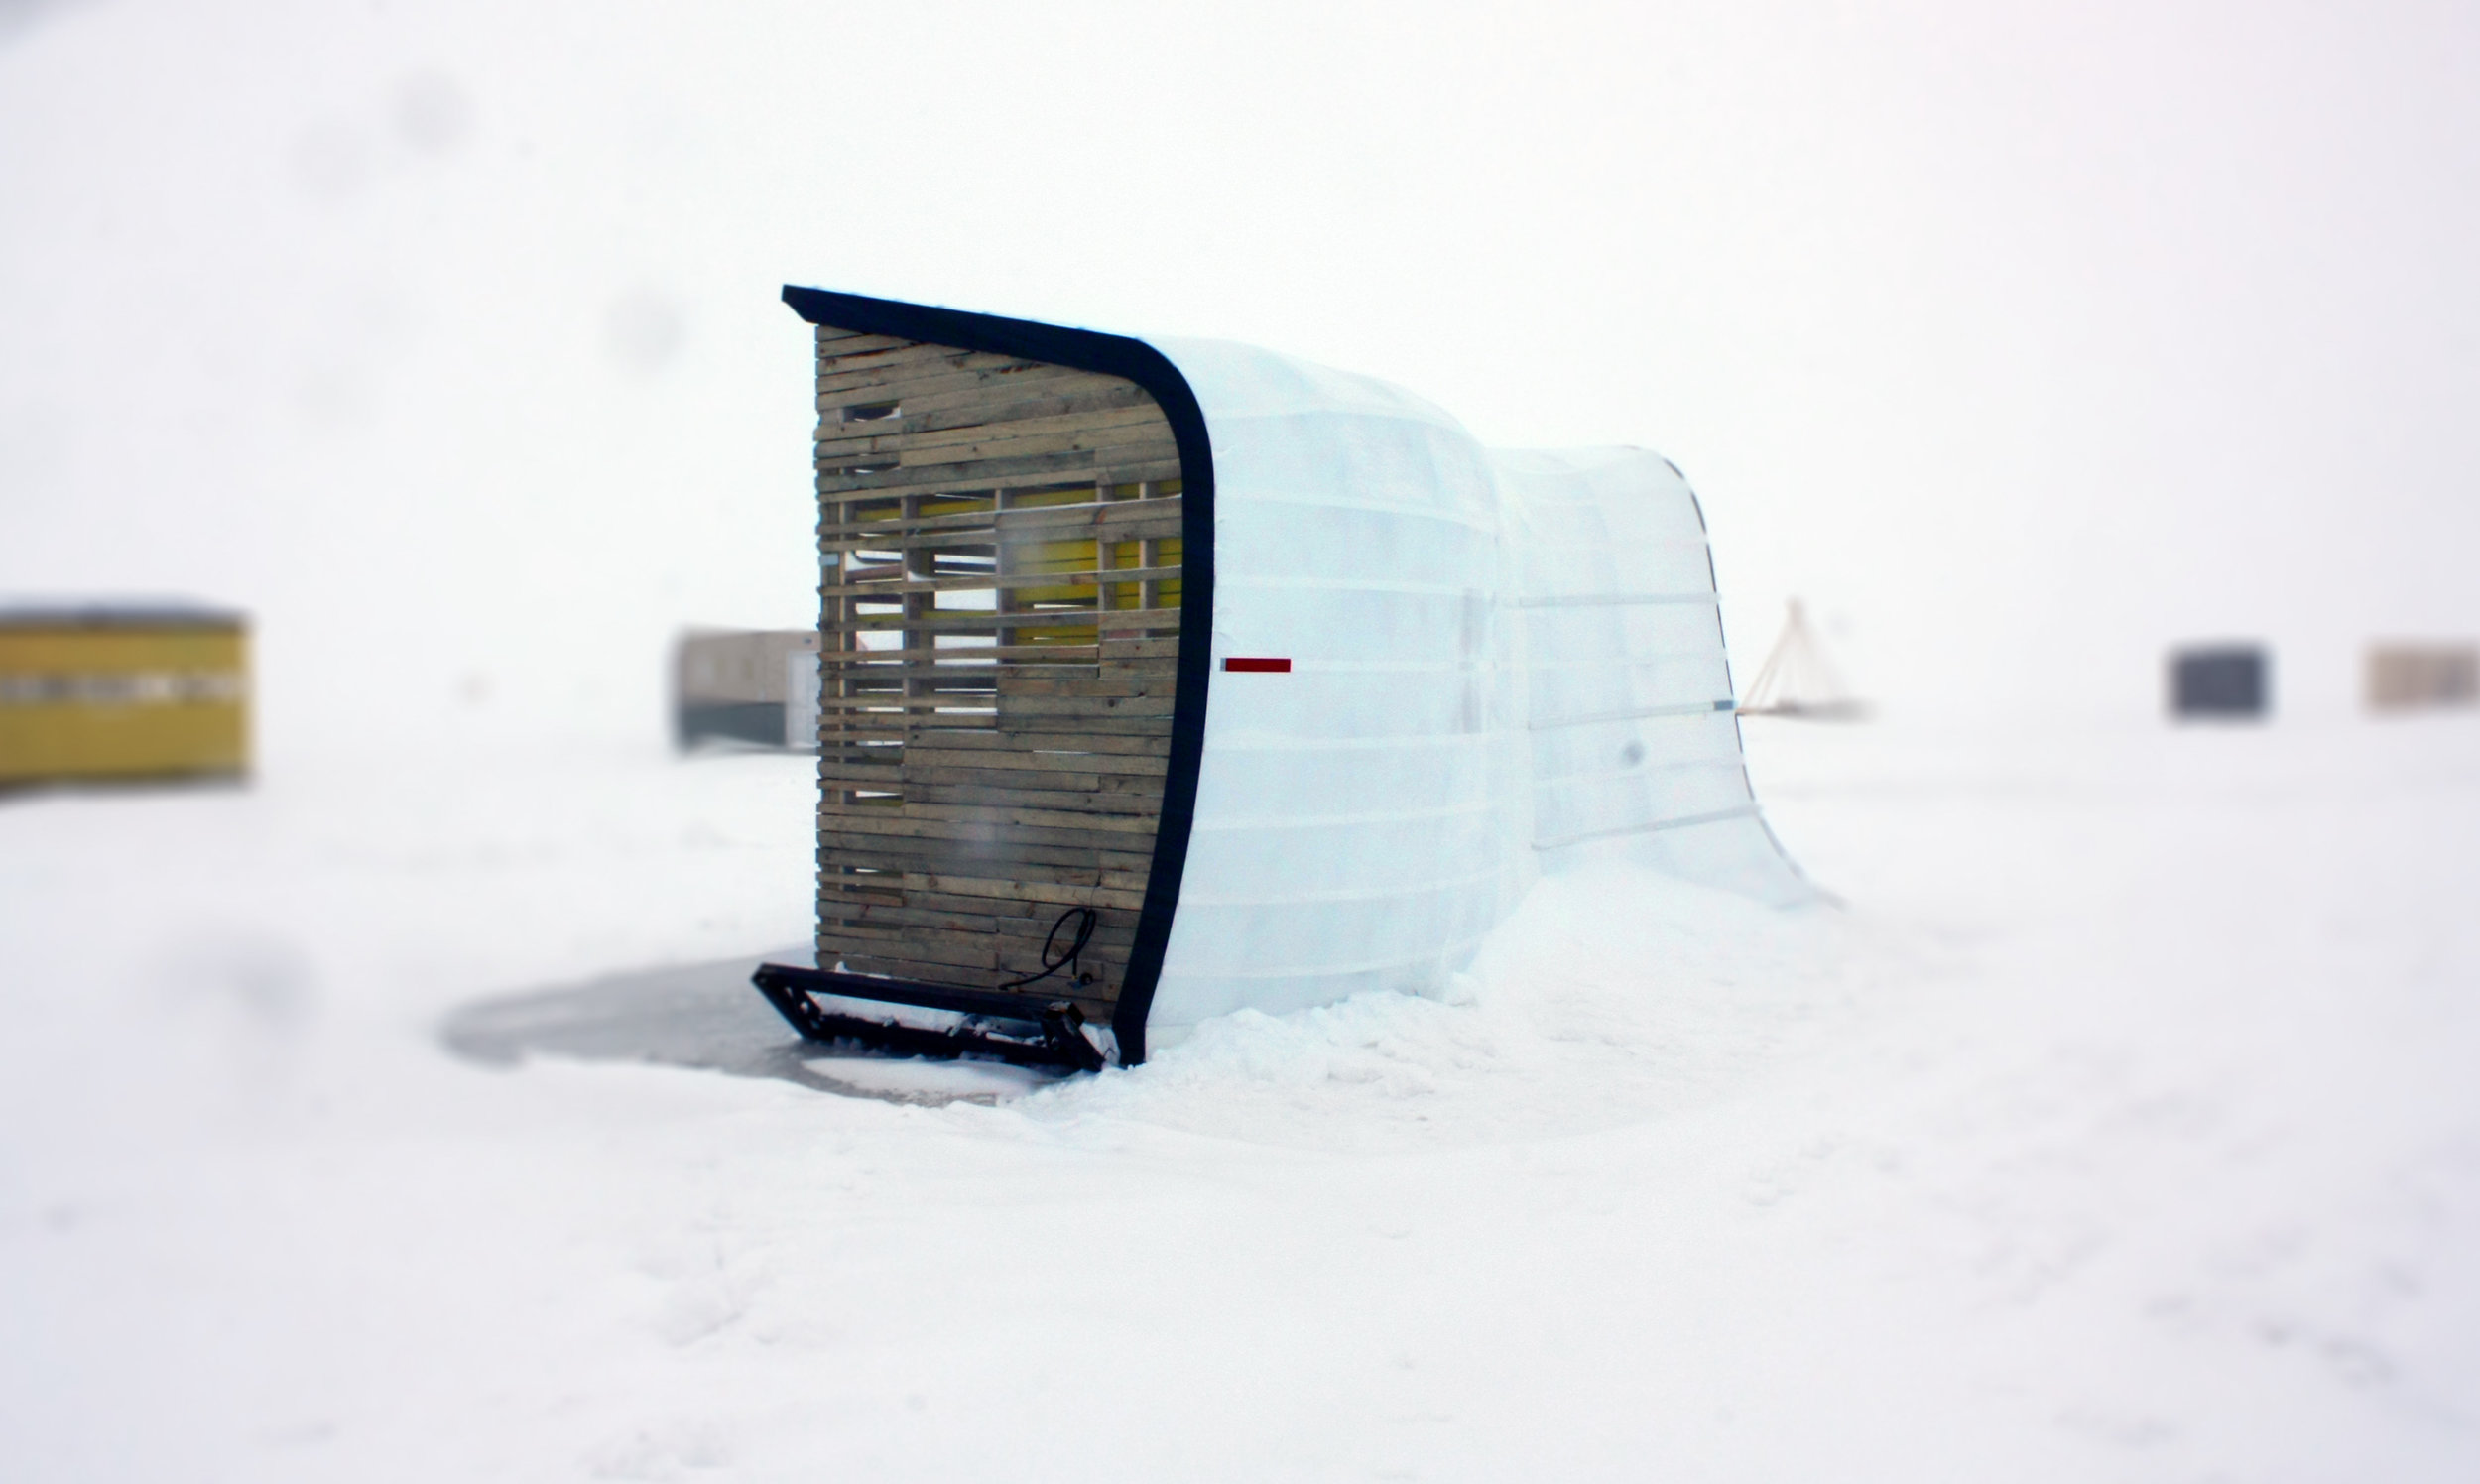 Snowdrift-inspired art shanty designed by NewStudio Architecture